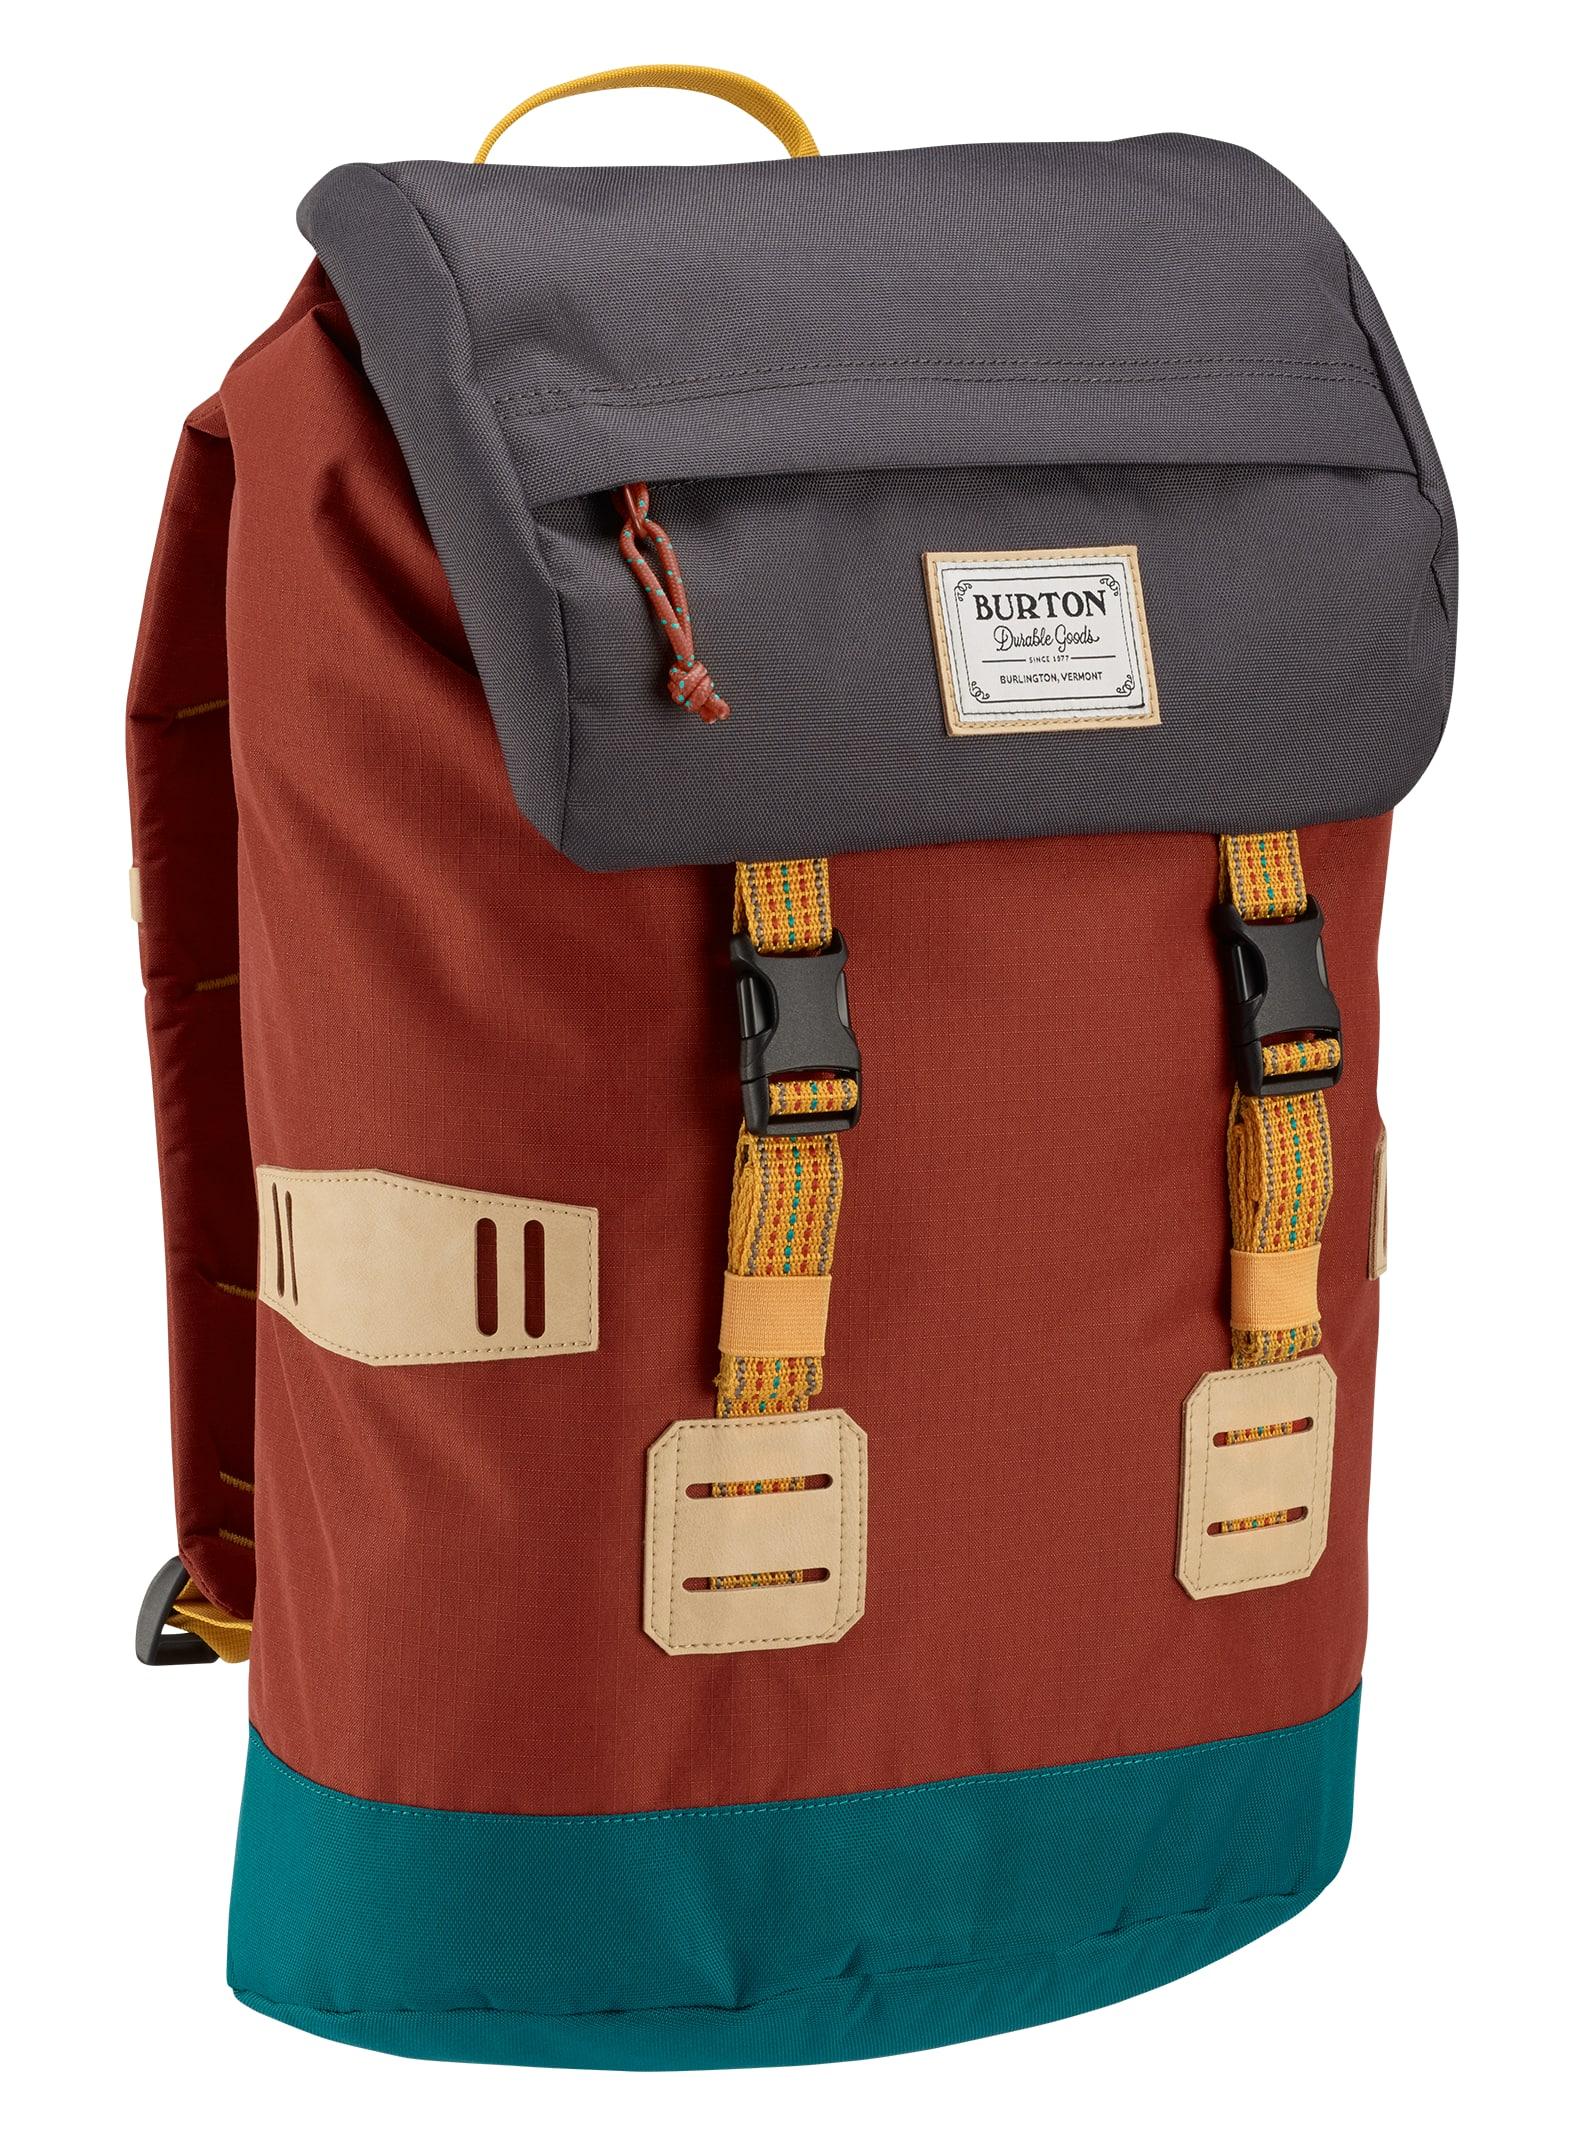 036caea7fe Burton Tinder Backpack